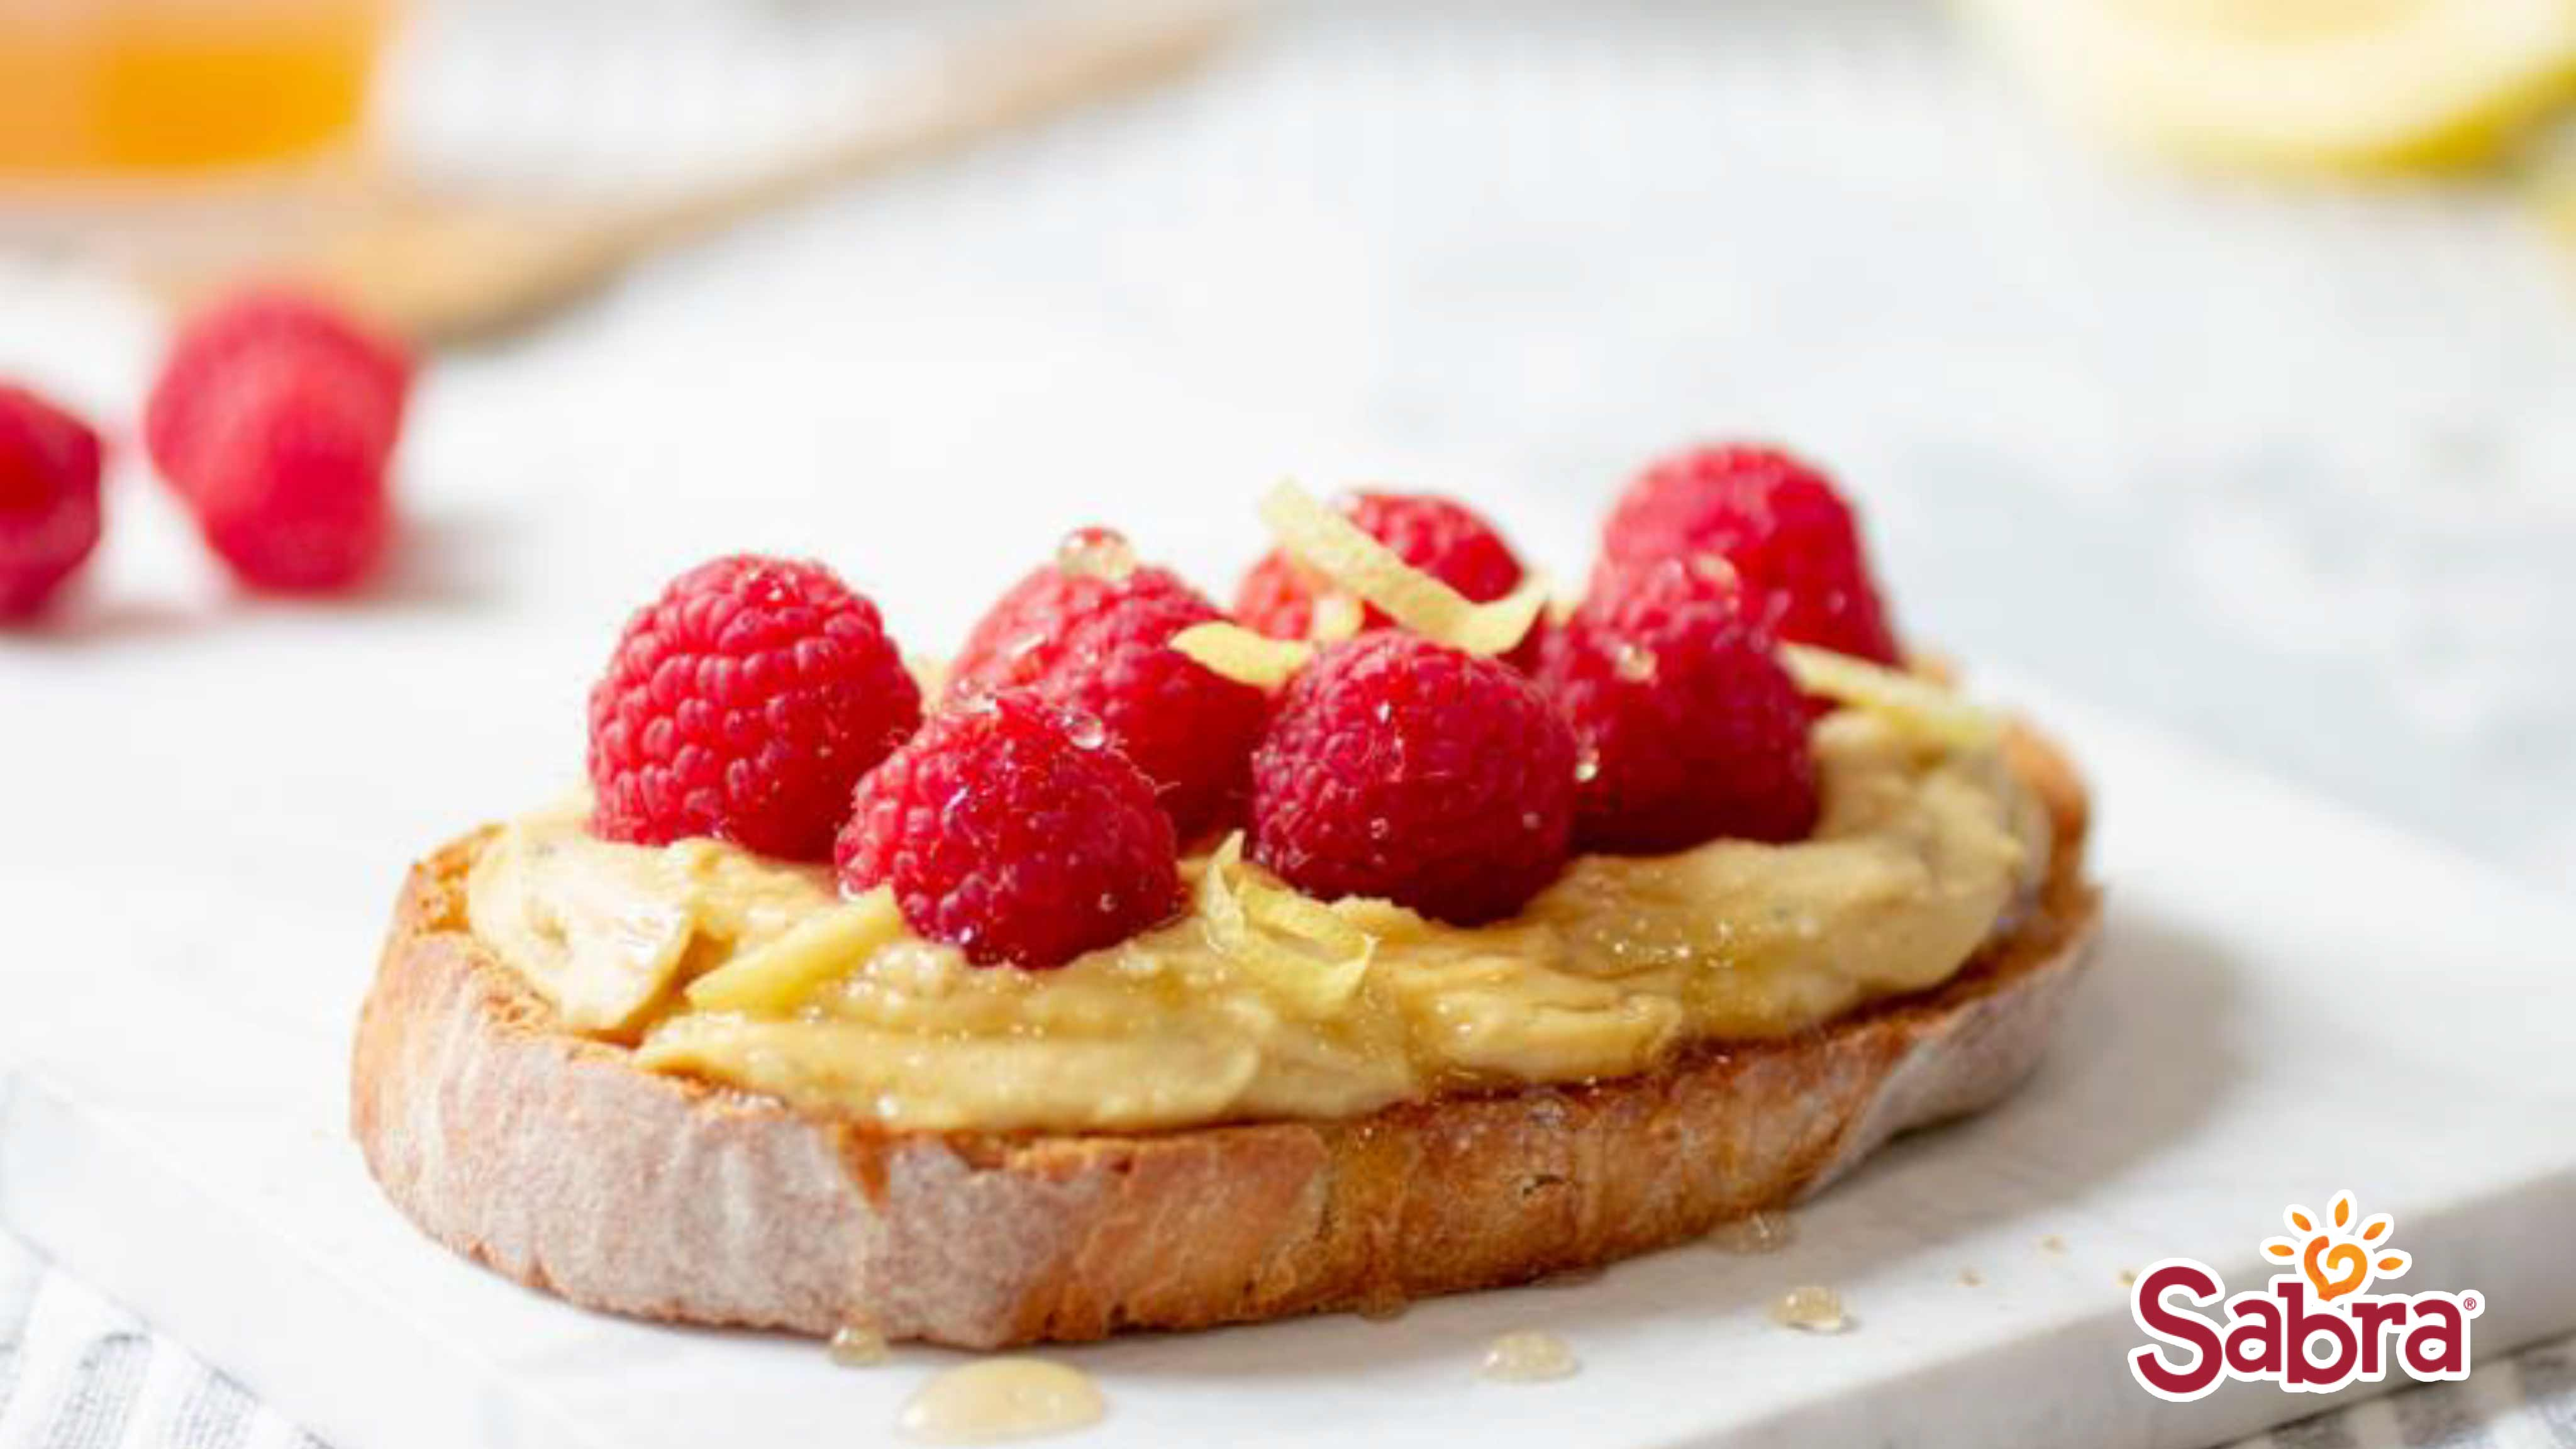 Image for Recipe Sabra Lemon Honey Raspberry Toast